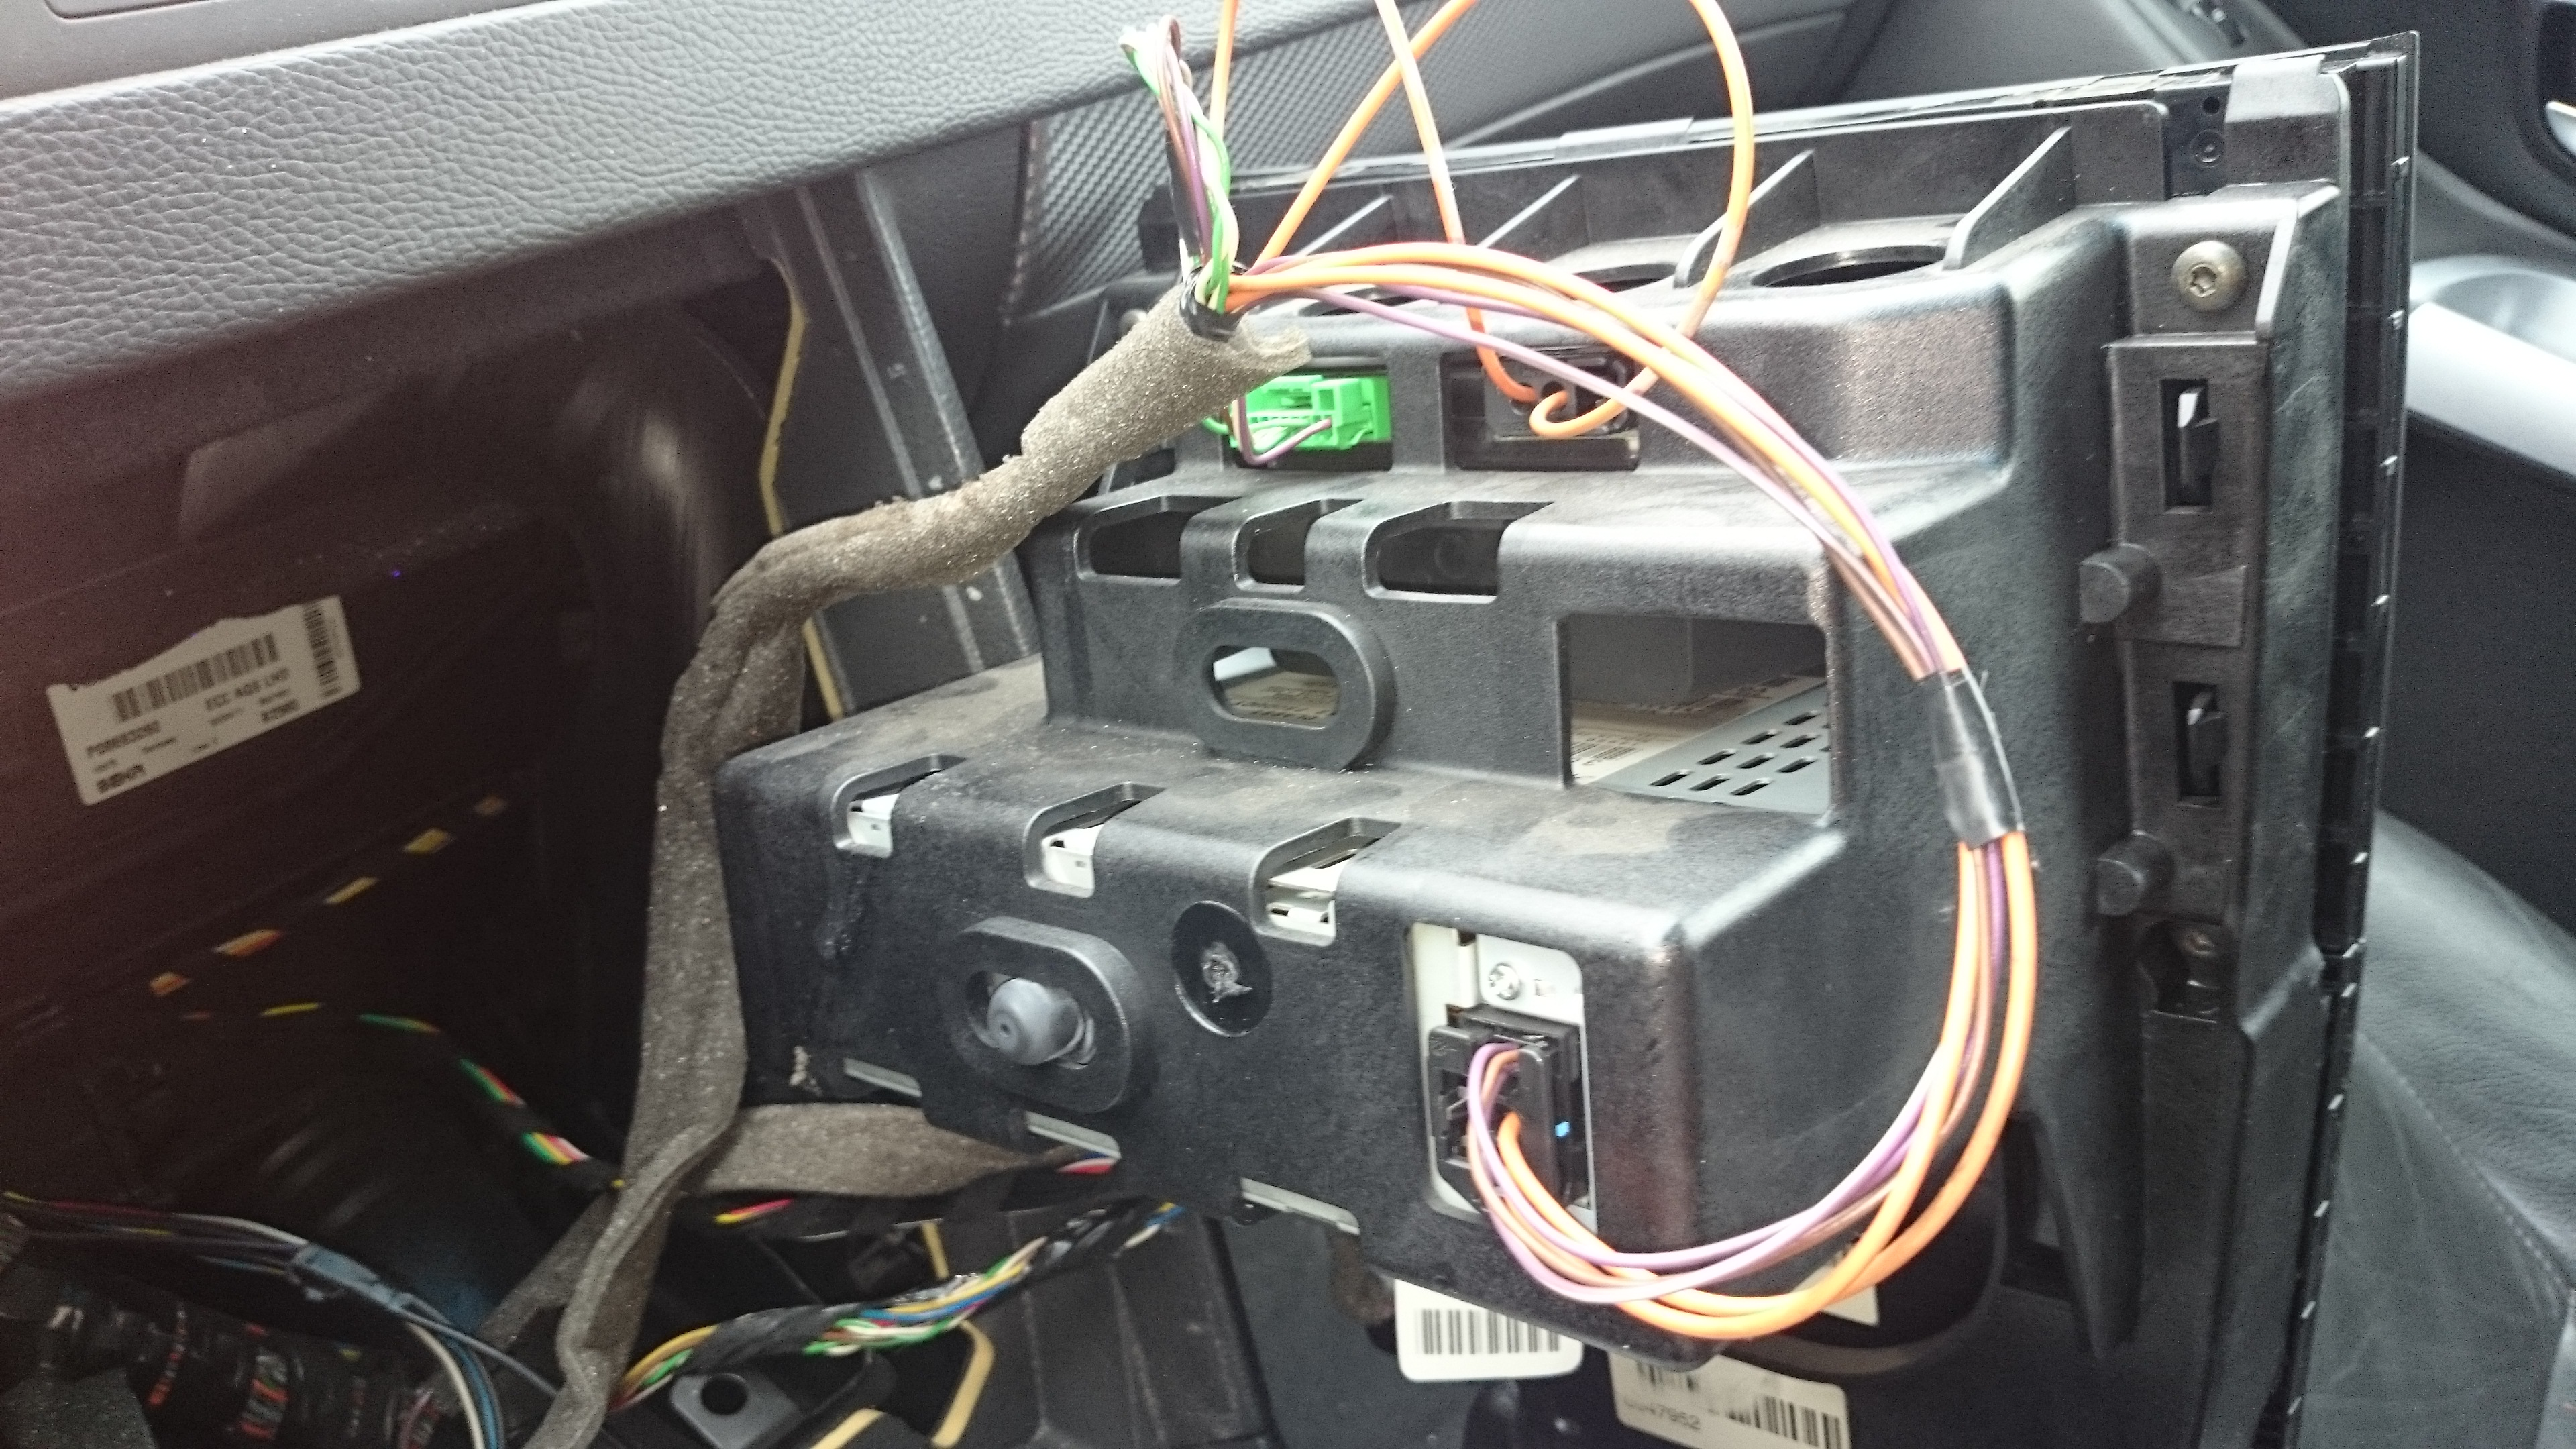 BZ_2308] Connector Location 2001 Volvo Xc90 Besides Volvo 850 Wiring  Diagram Wiring Diagram | Volvo Xc90 Stereo Wiring Diagram |  | Exxlu Ivoro Rect Mohammedshrine Librar Wiring 101